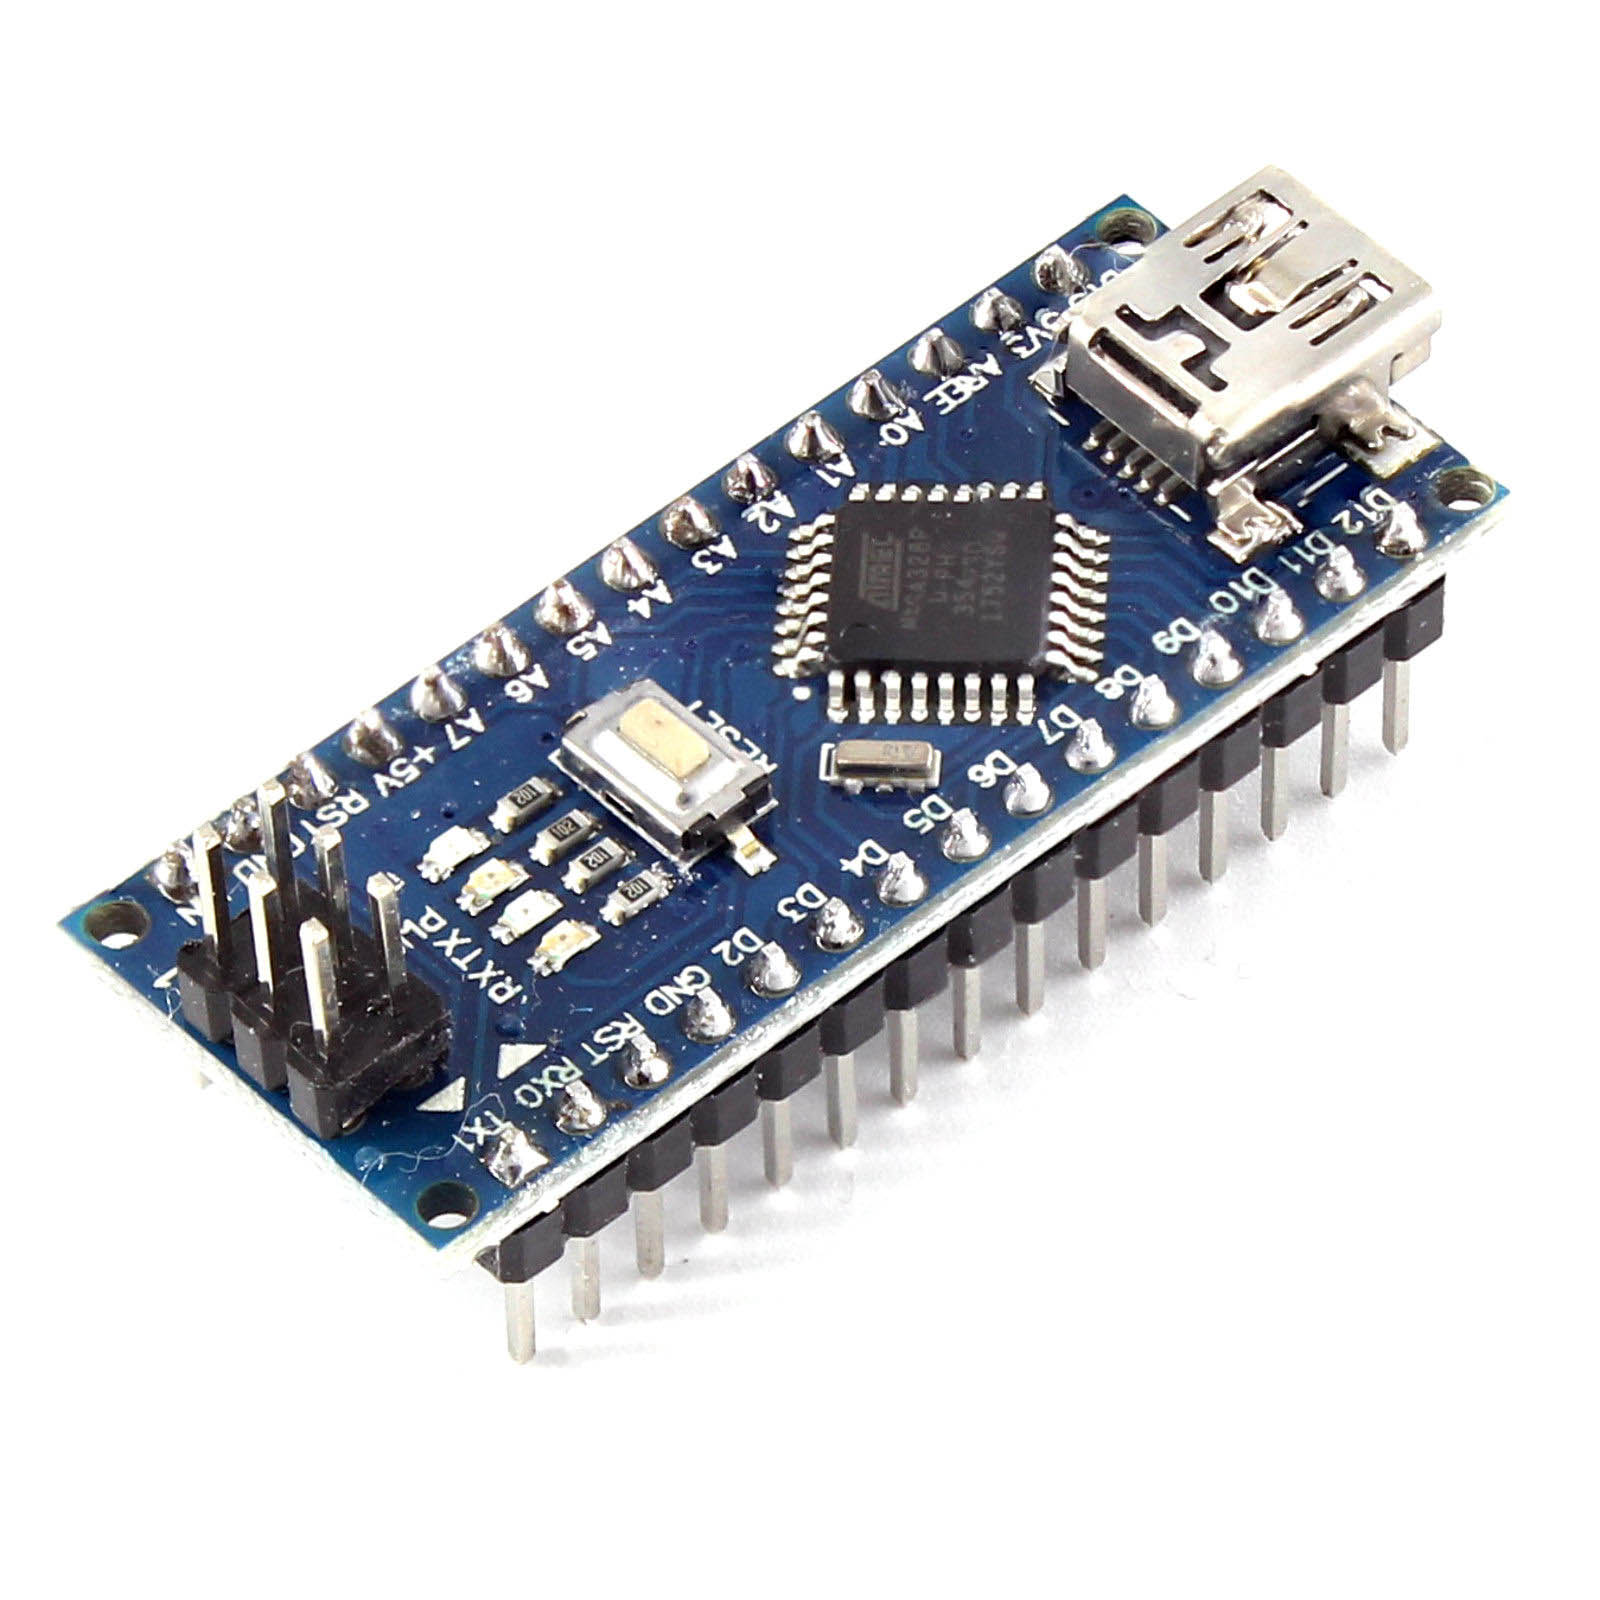 Nano V3.0 Atmega 328P Already Soldered Ready Assembled CH340G 5V 16M Micro-controller Board OUJ99